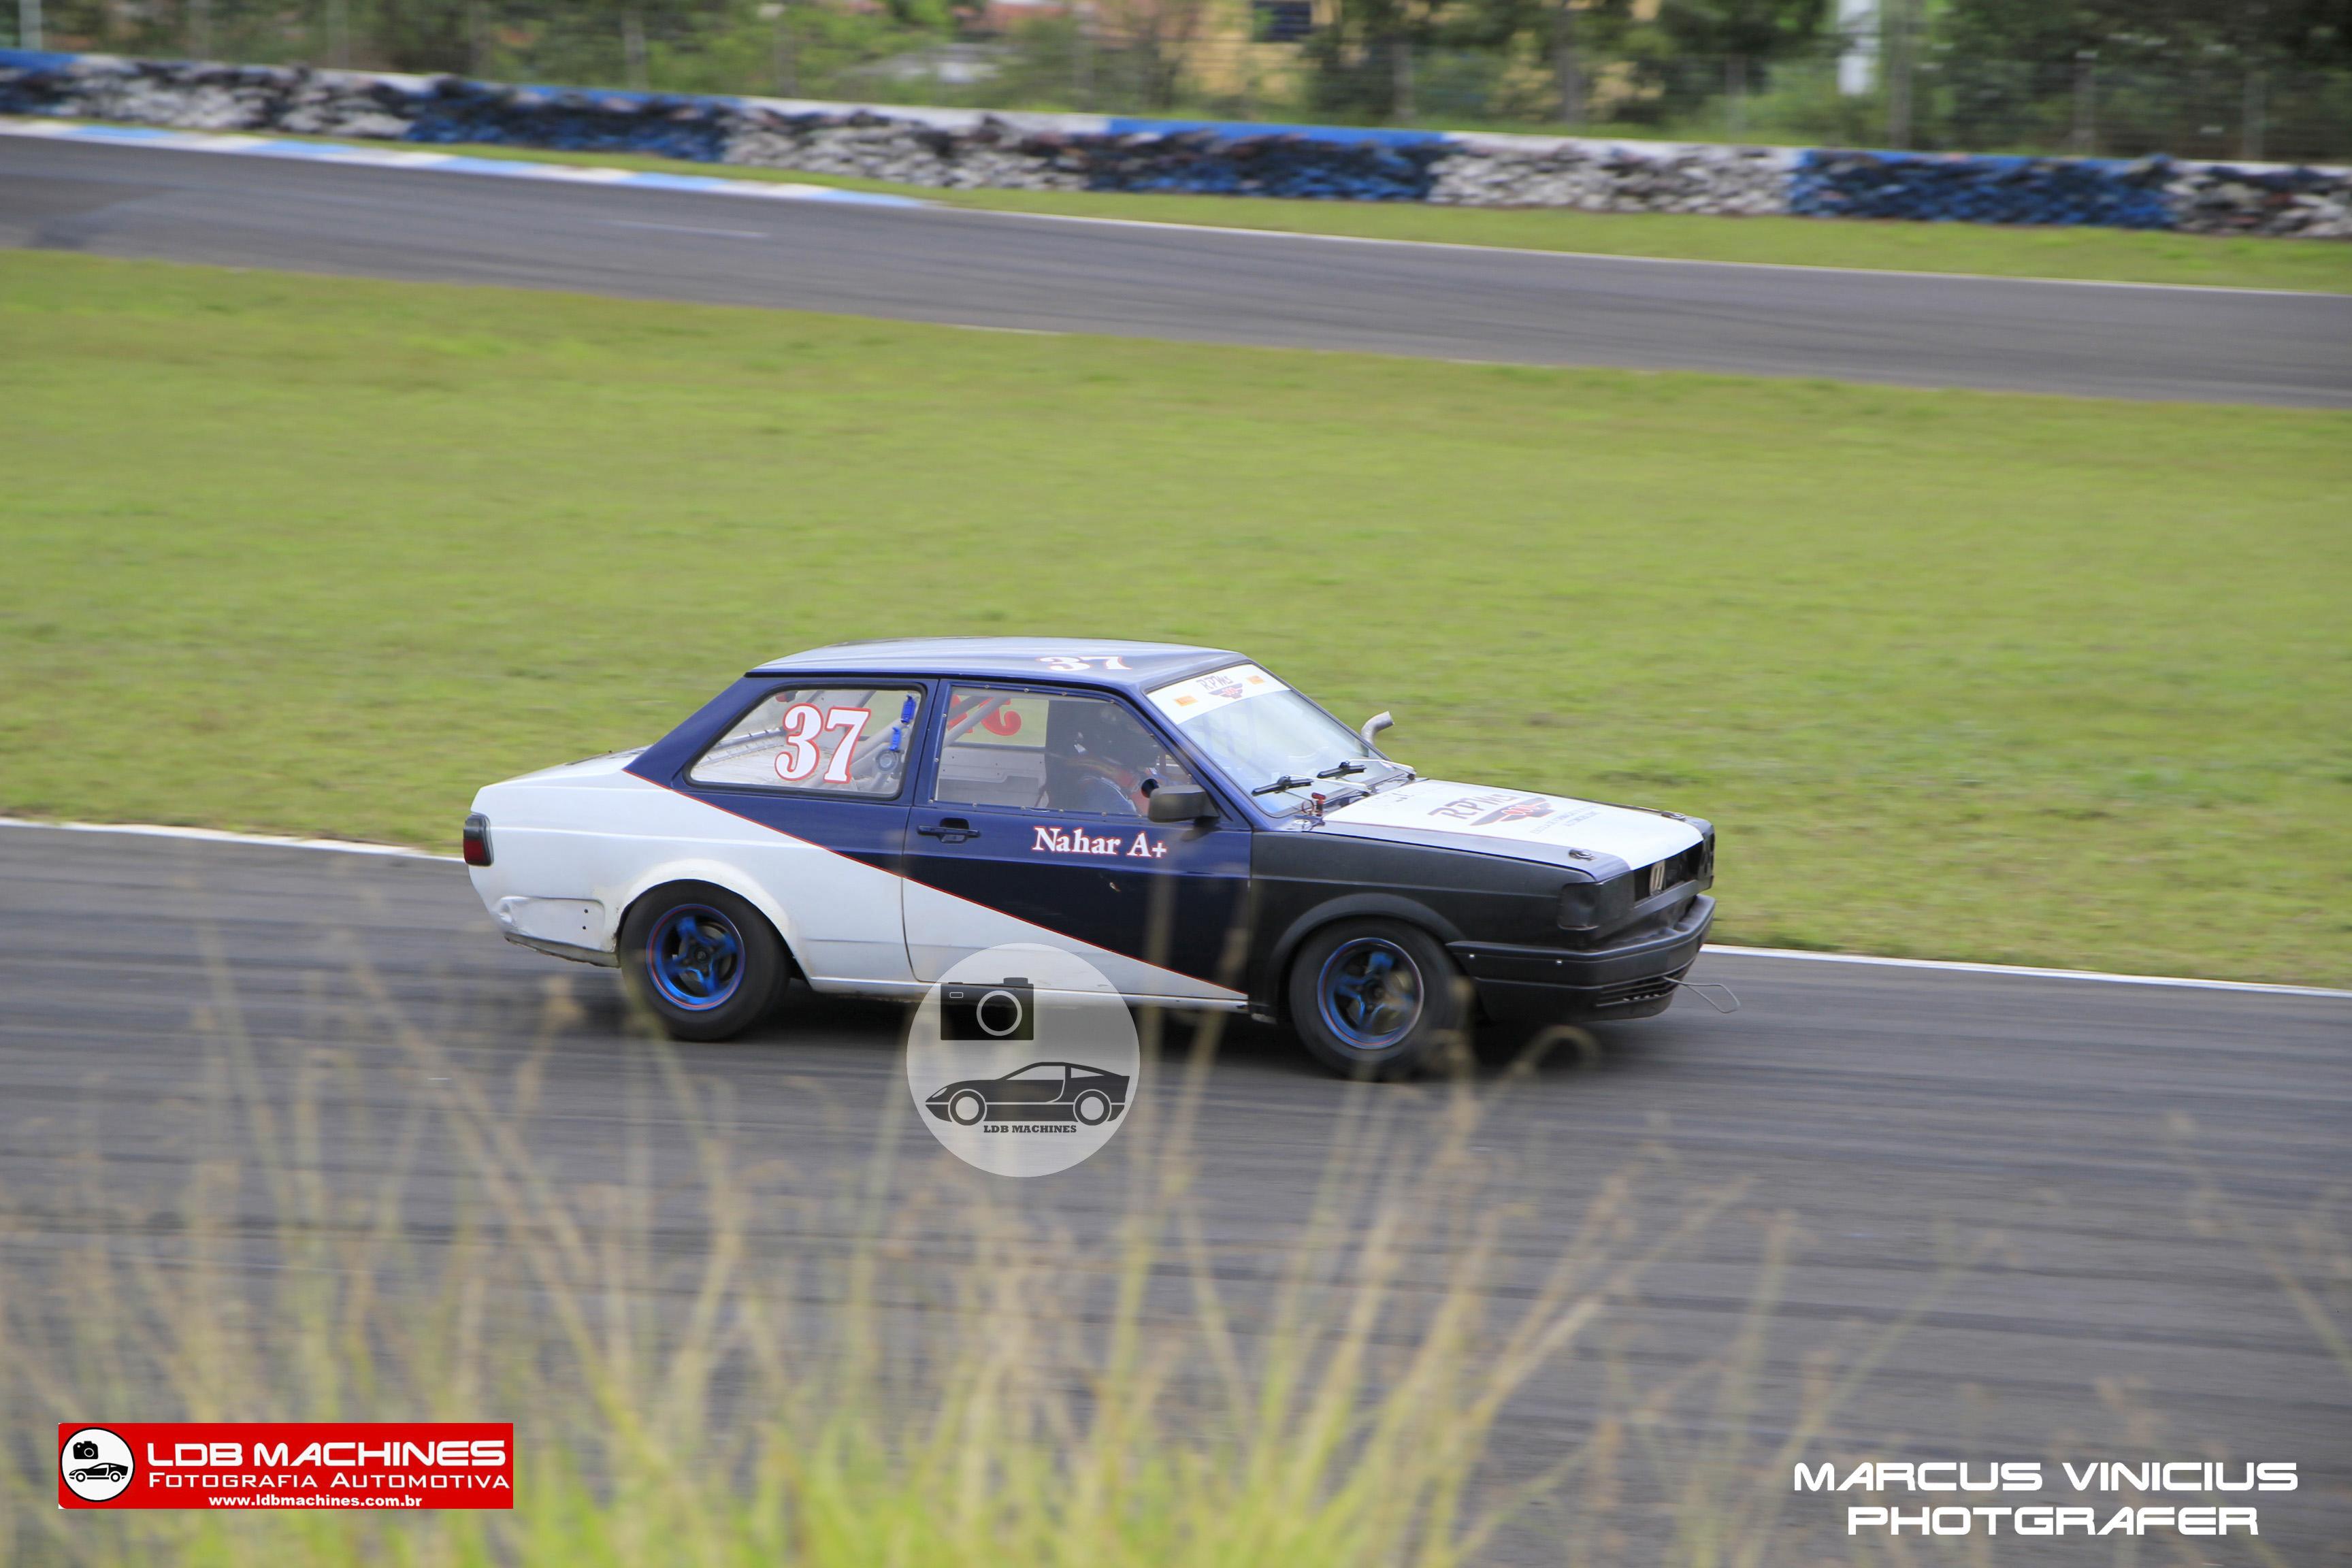 MG 1031